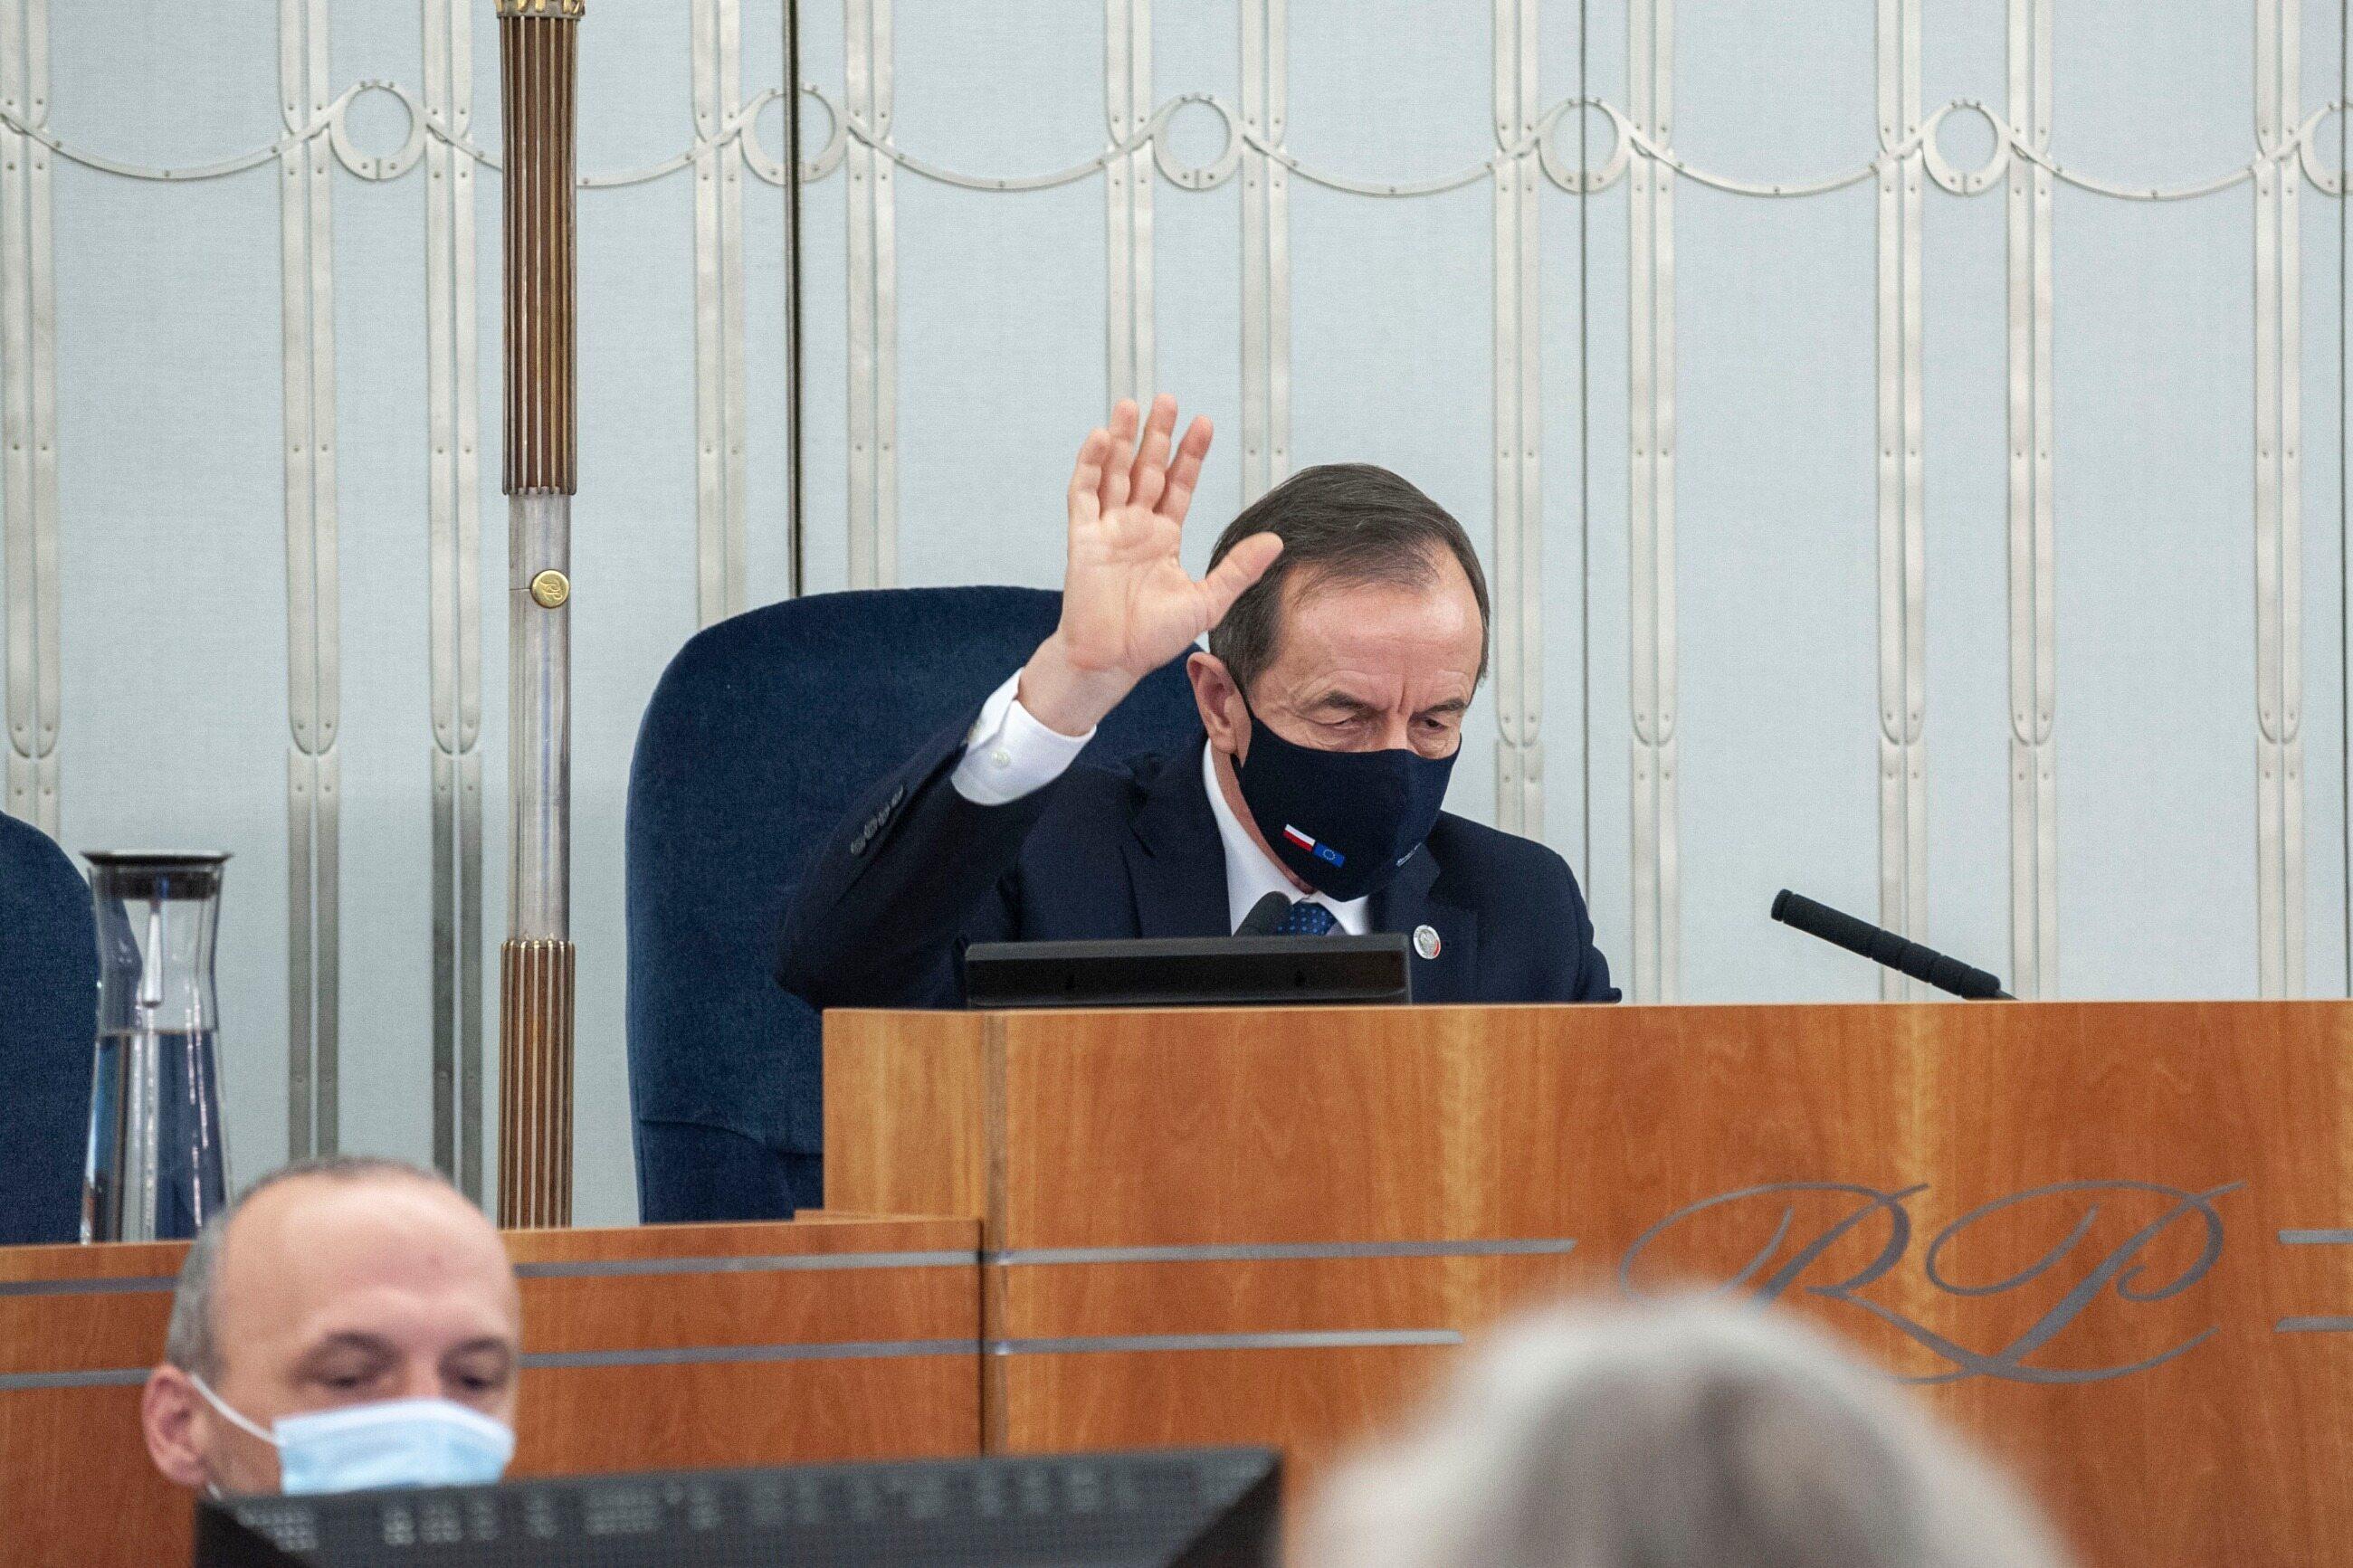 Marszałek Senatu, Tomasz Grodzki